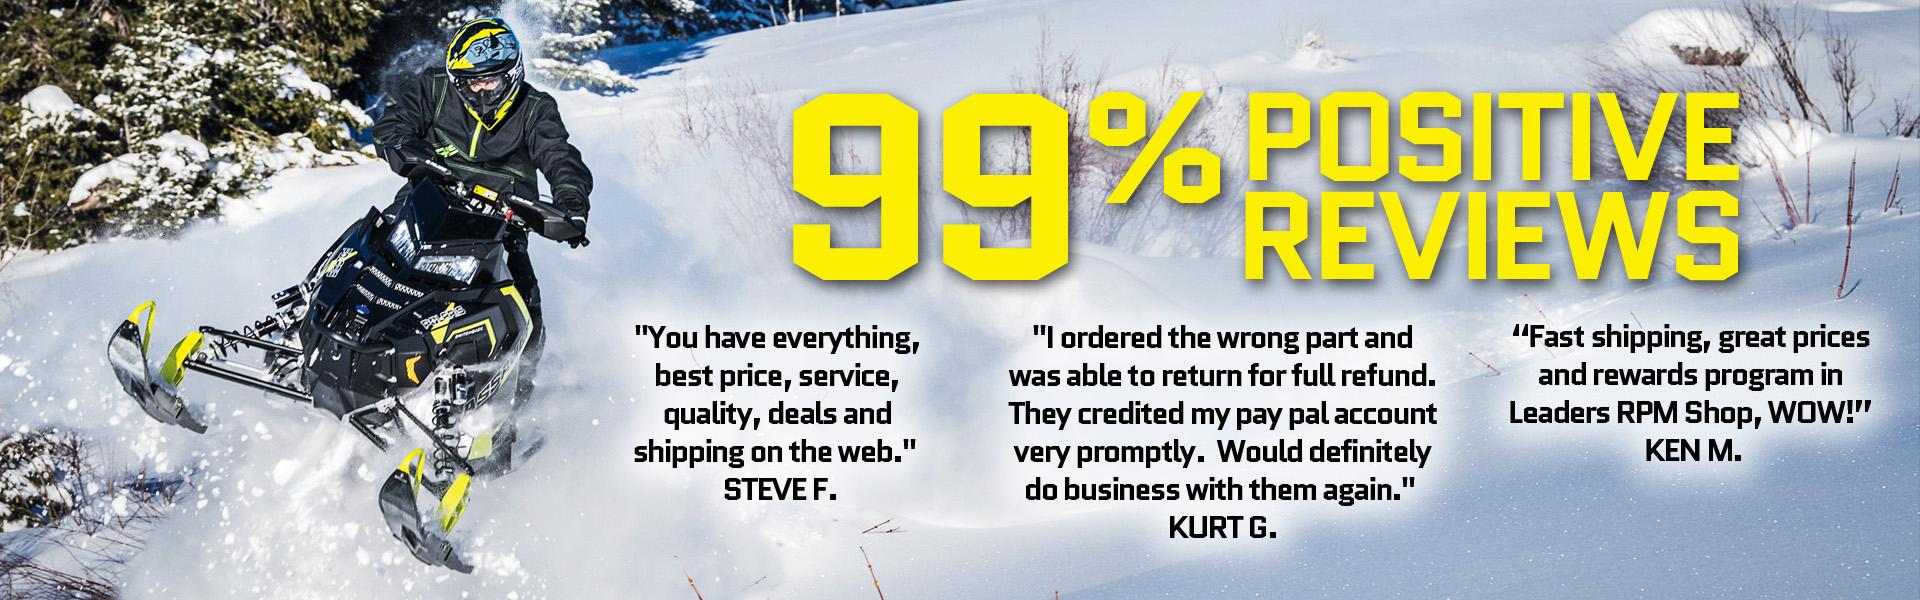 Google Reviews, Yelp, Better Business Bureau, Yellow Pages, Reviews, Ski-doo Snowmobile